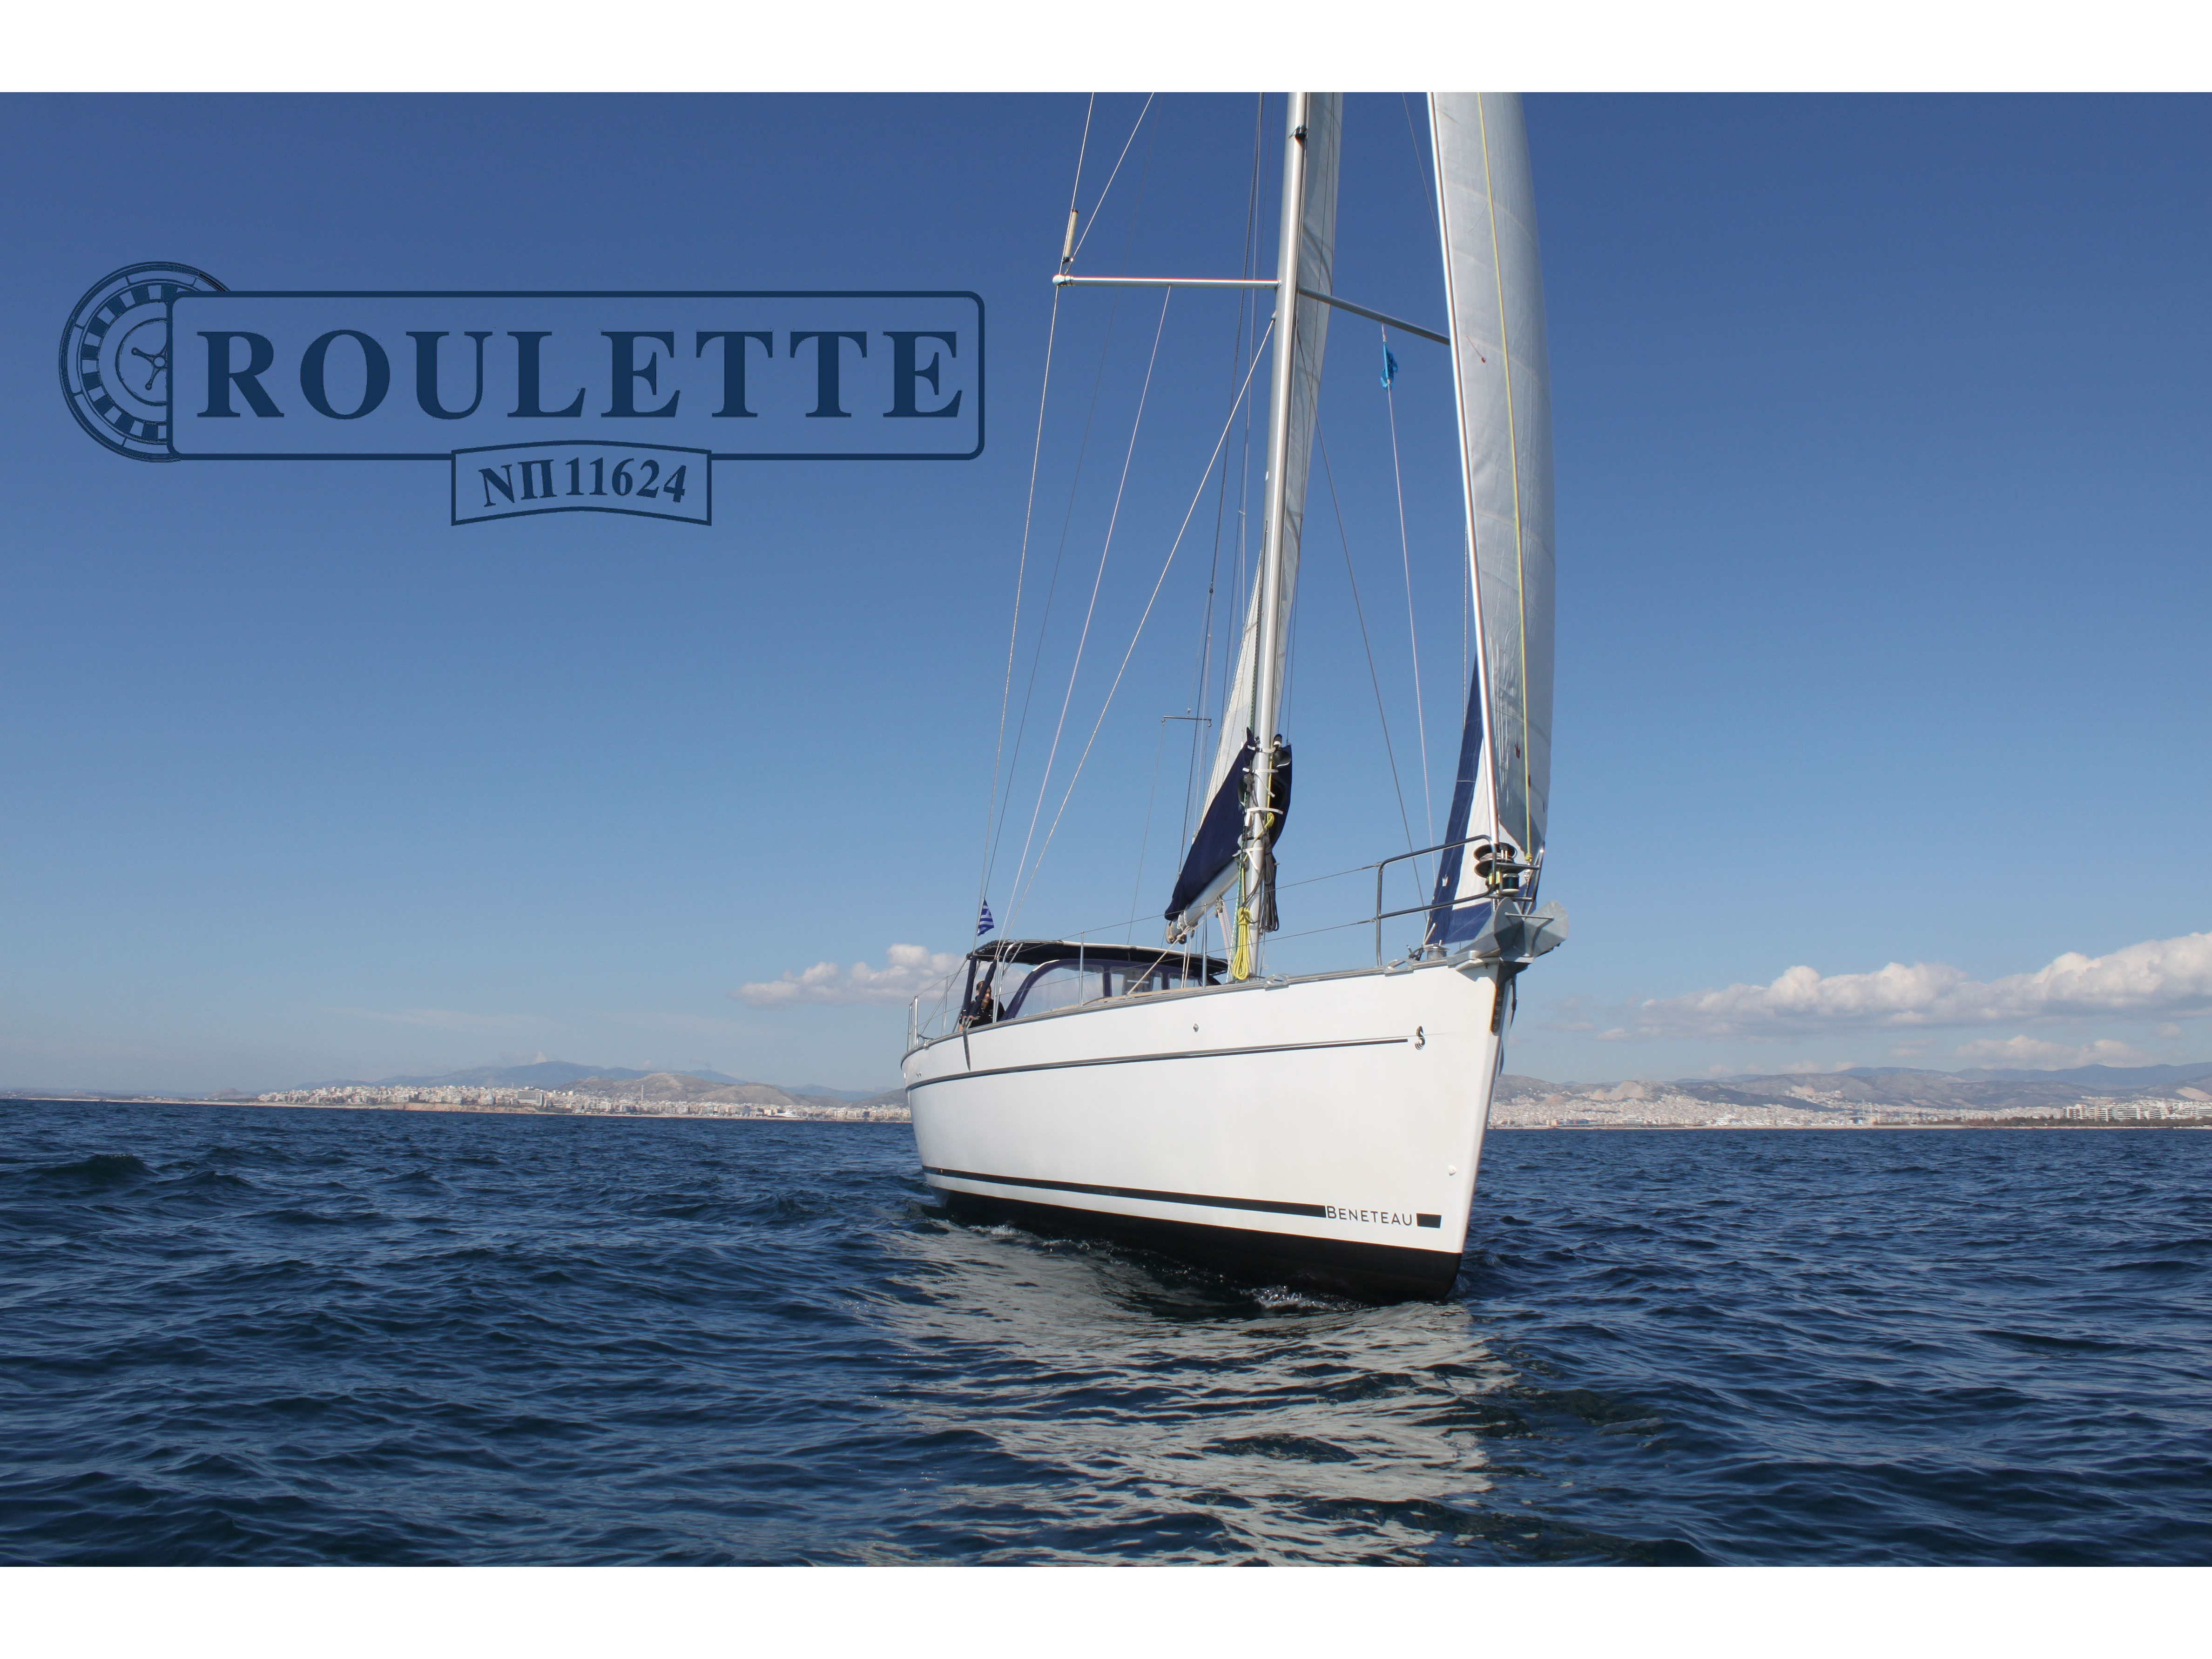 Roulette - (A/C - Generator - Refit 2020) Cyclades 50.5